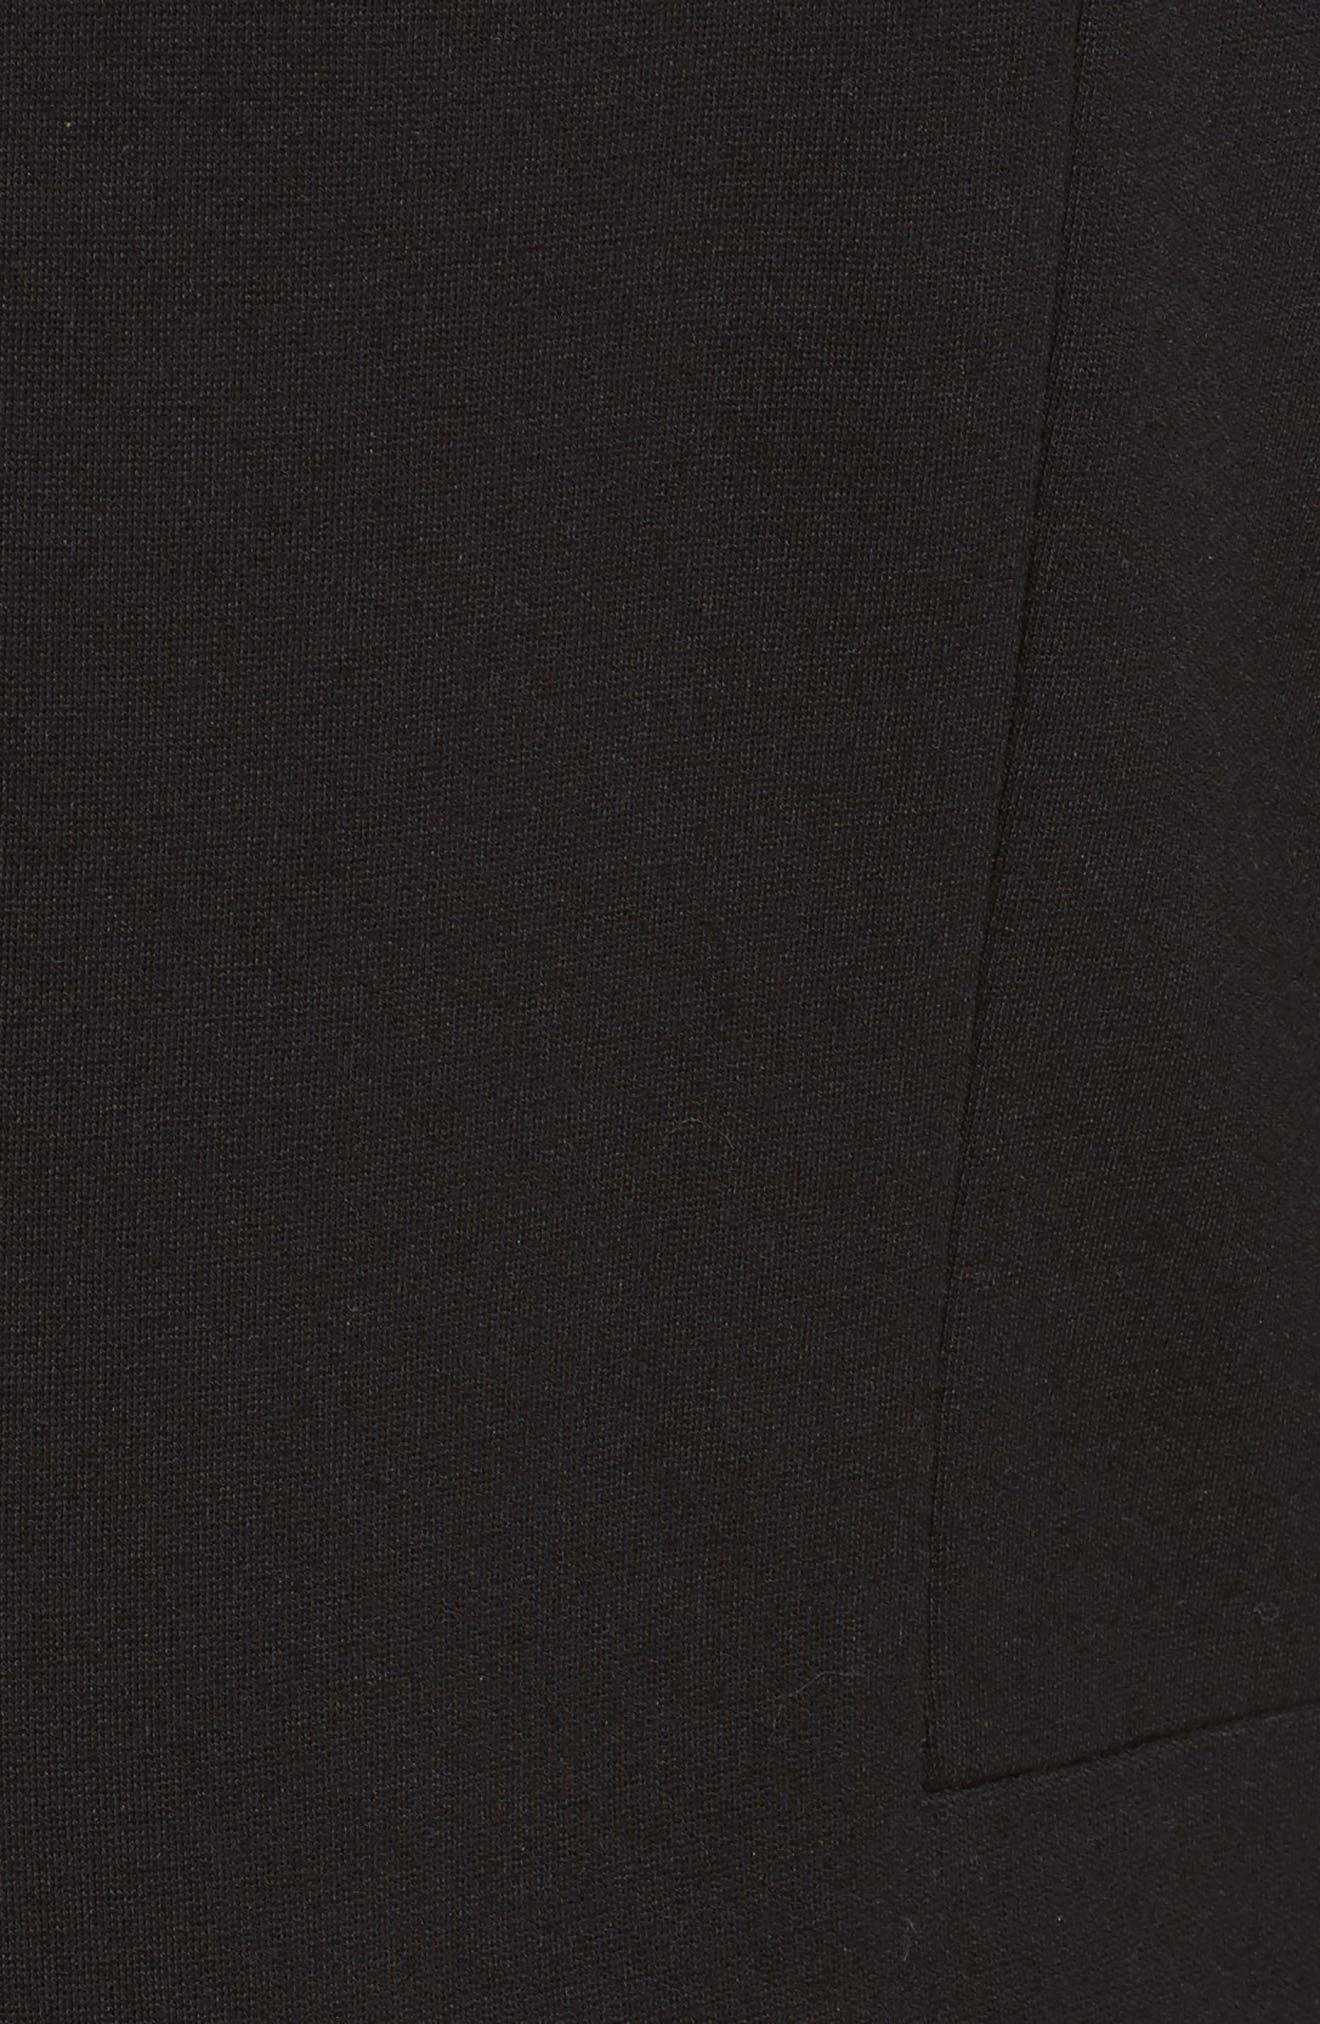 Marissa Punto Milano Dress,                             Alternate thumbnail 5, color,                             001